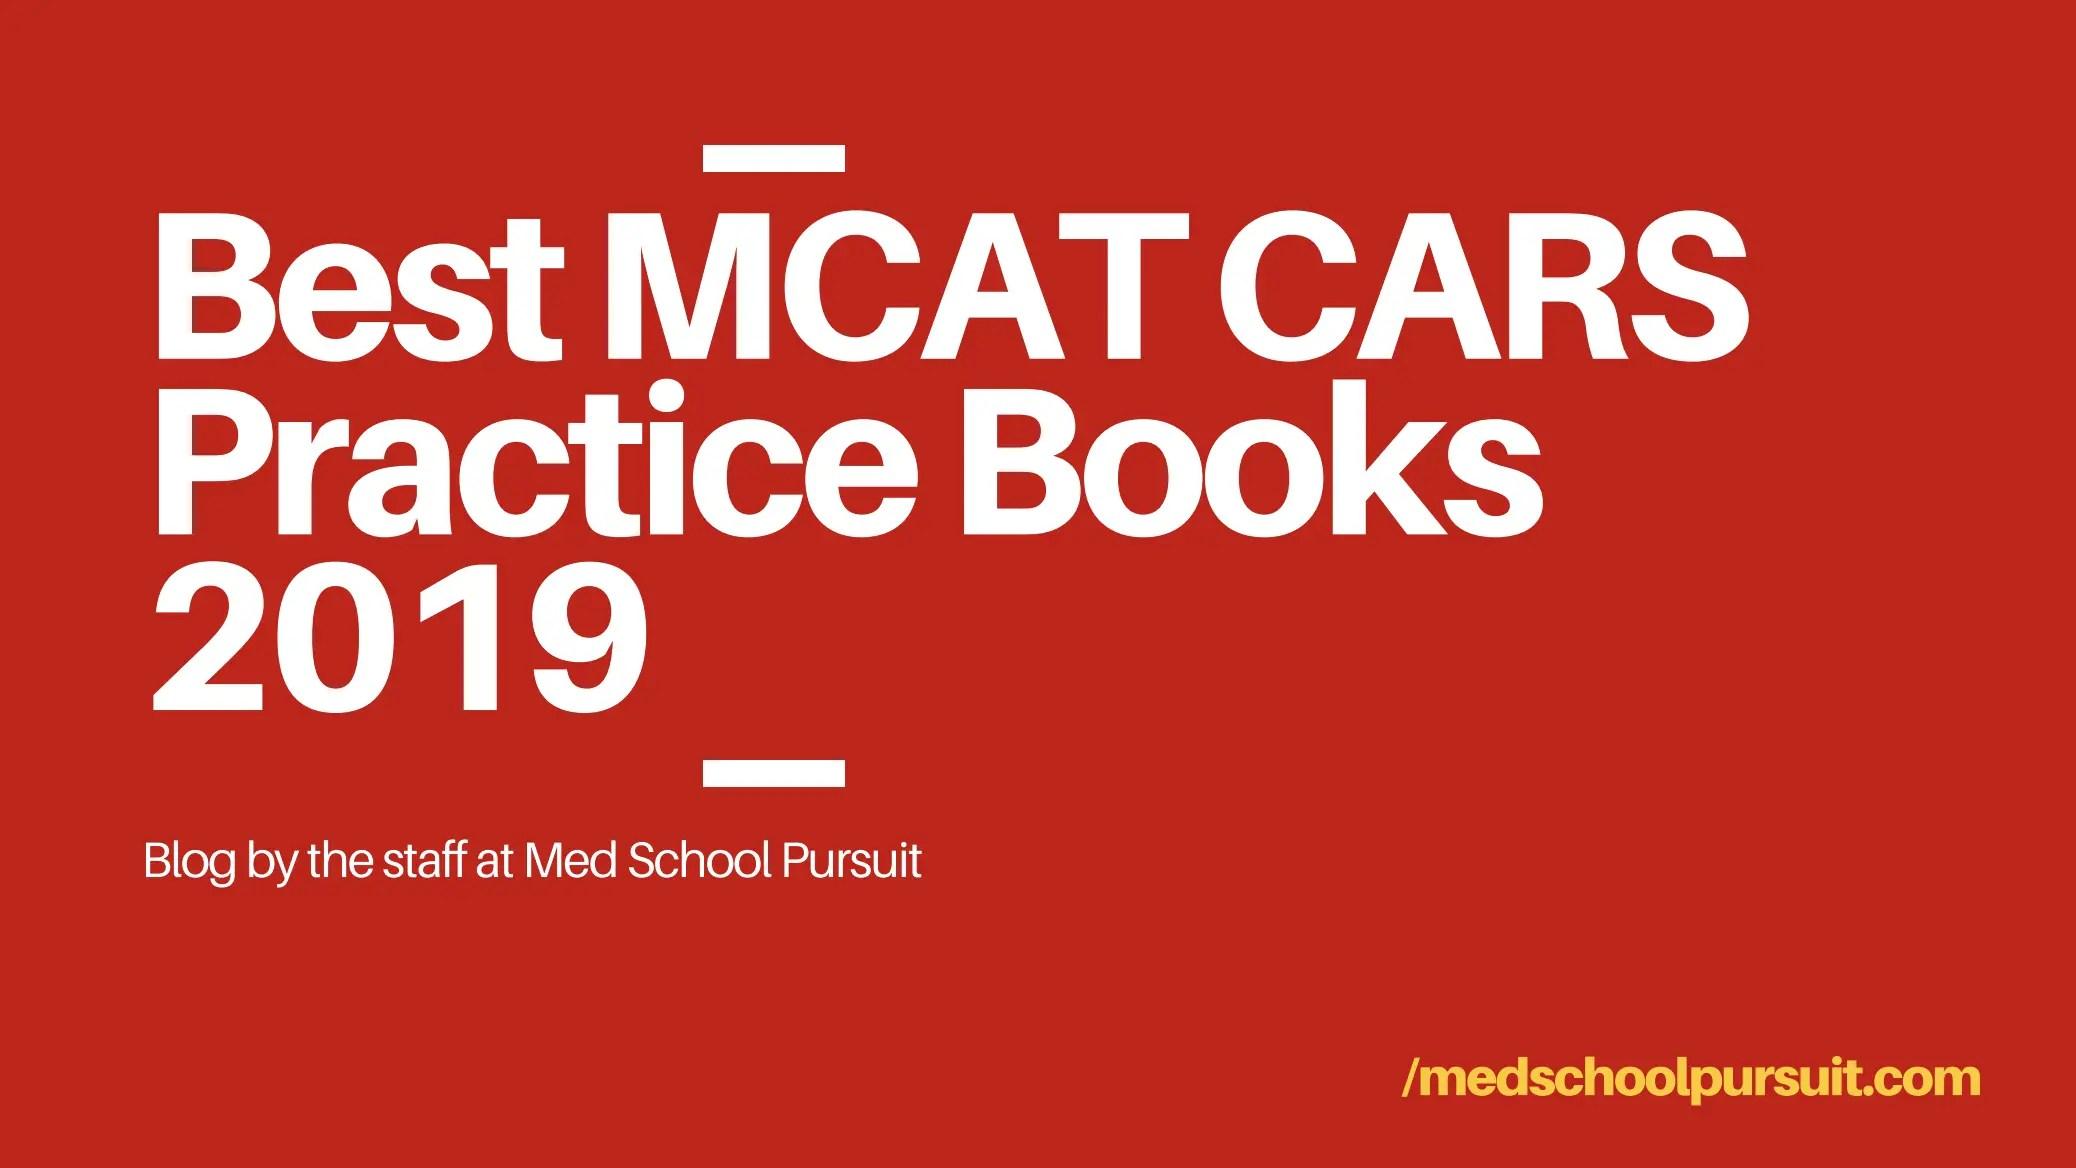 Best MCAT Prep Books 2019 - Med School Pursuit